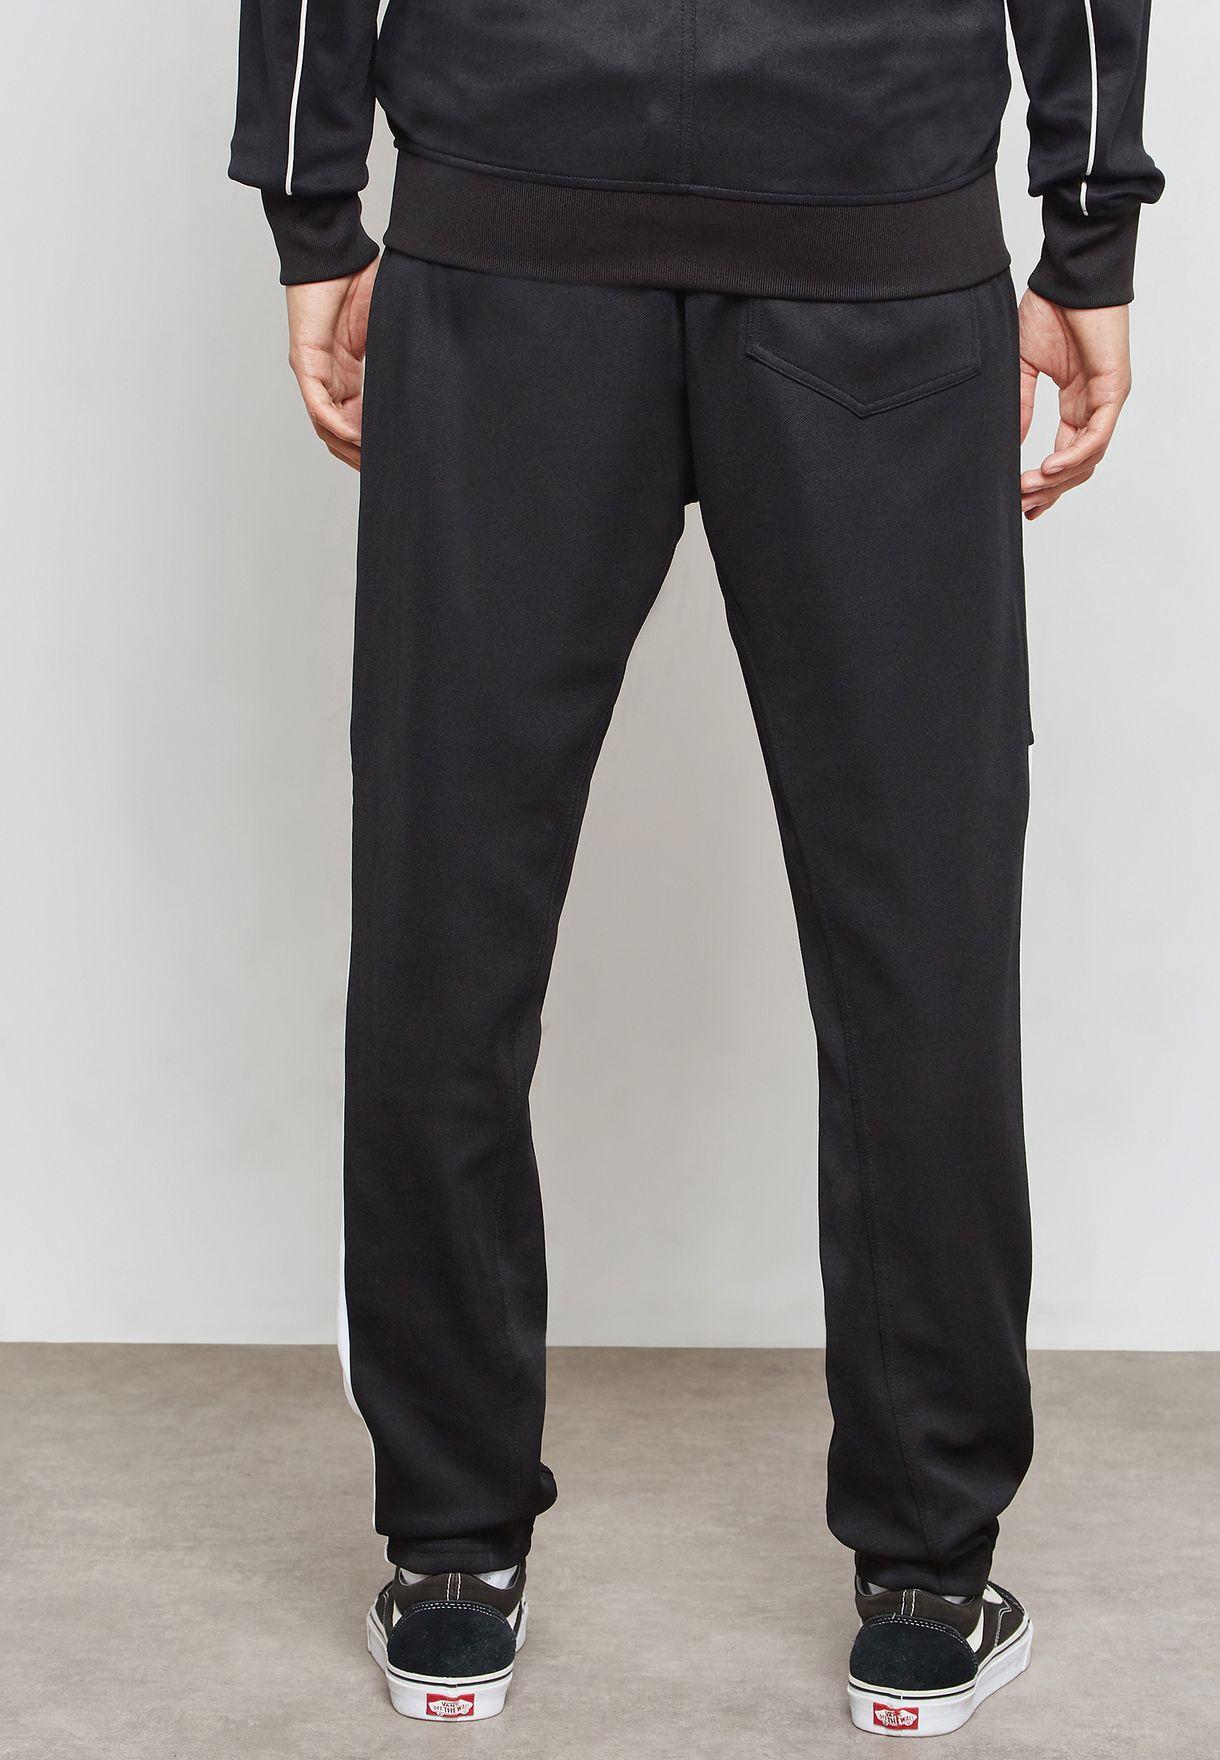 Rodis Drawstring Sweatpants